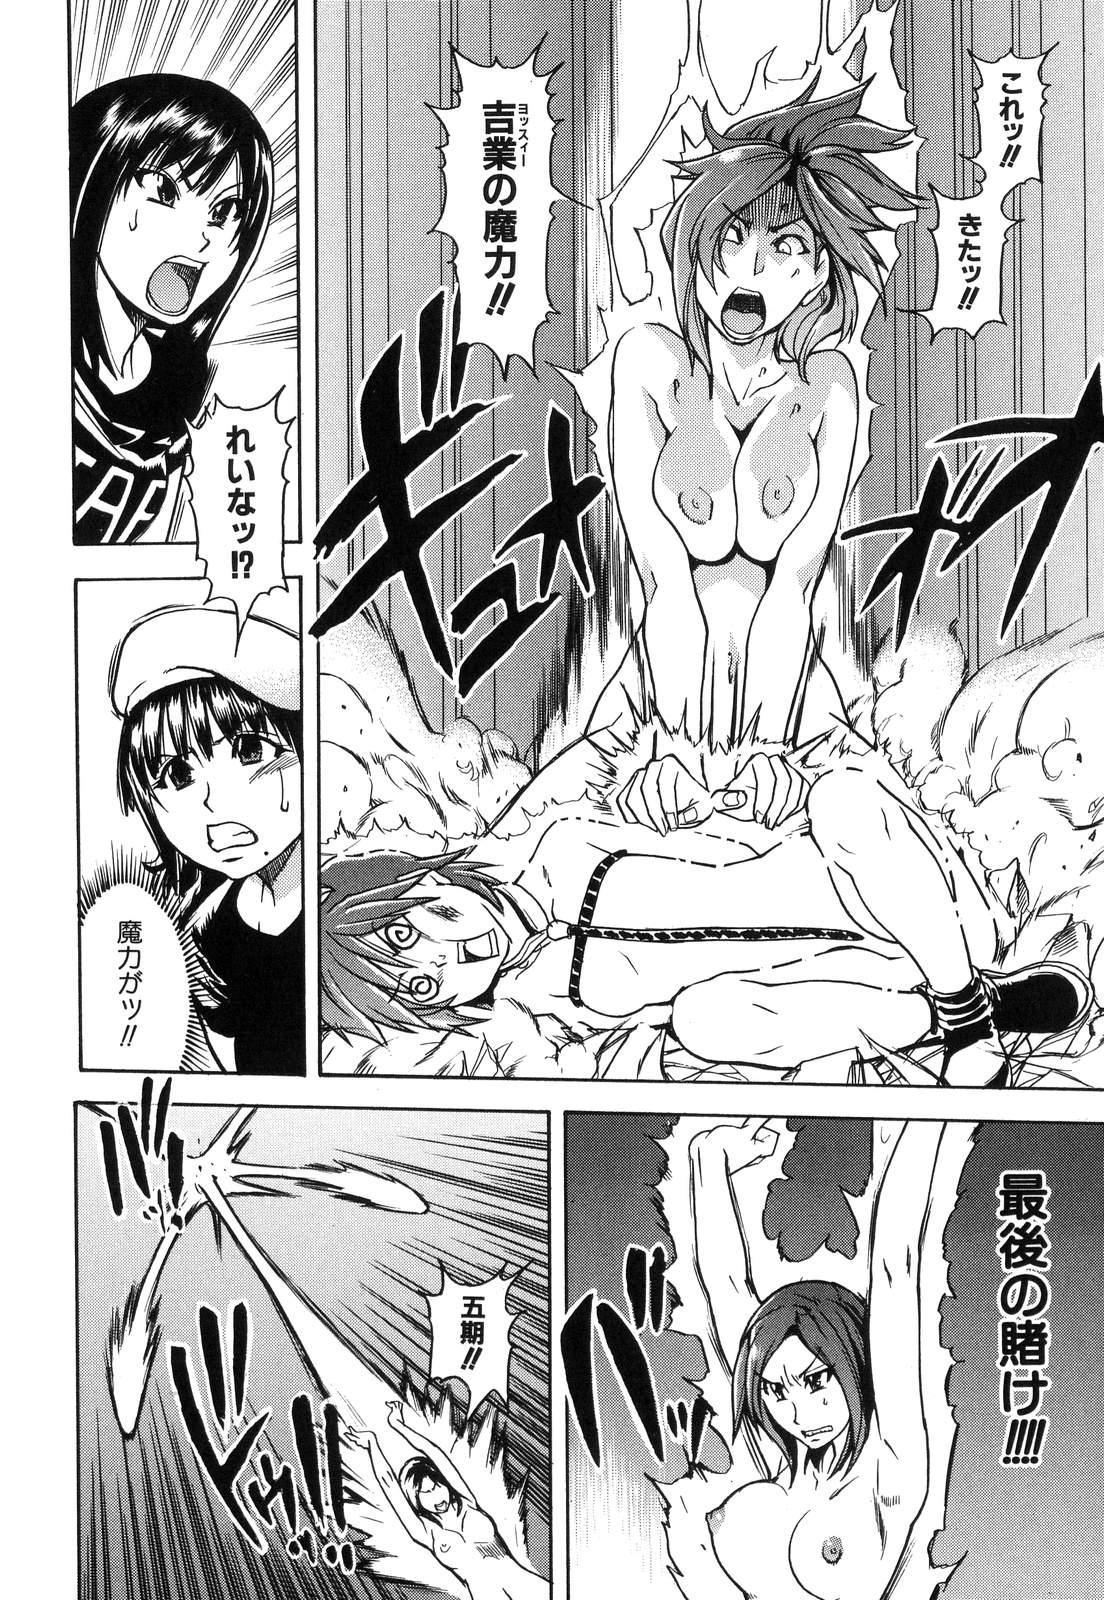 Shining Musume. 6. Rainbow Six 155